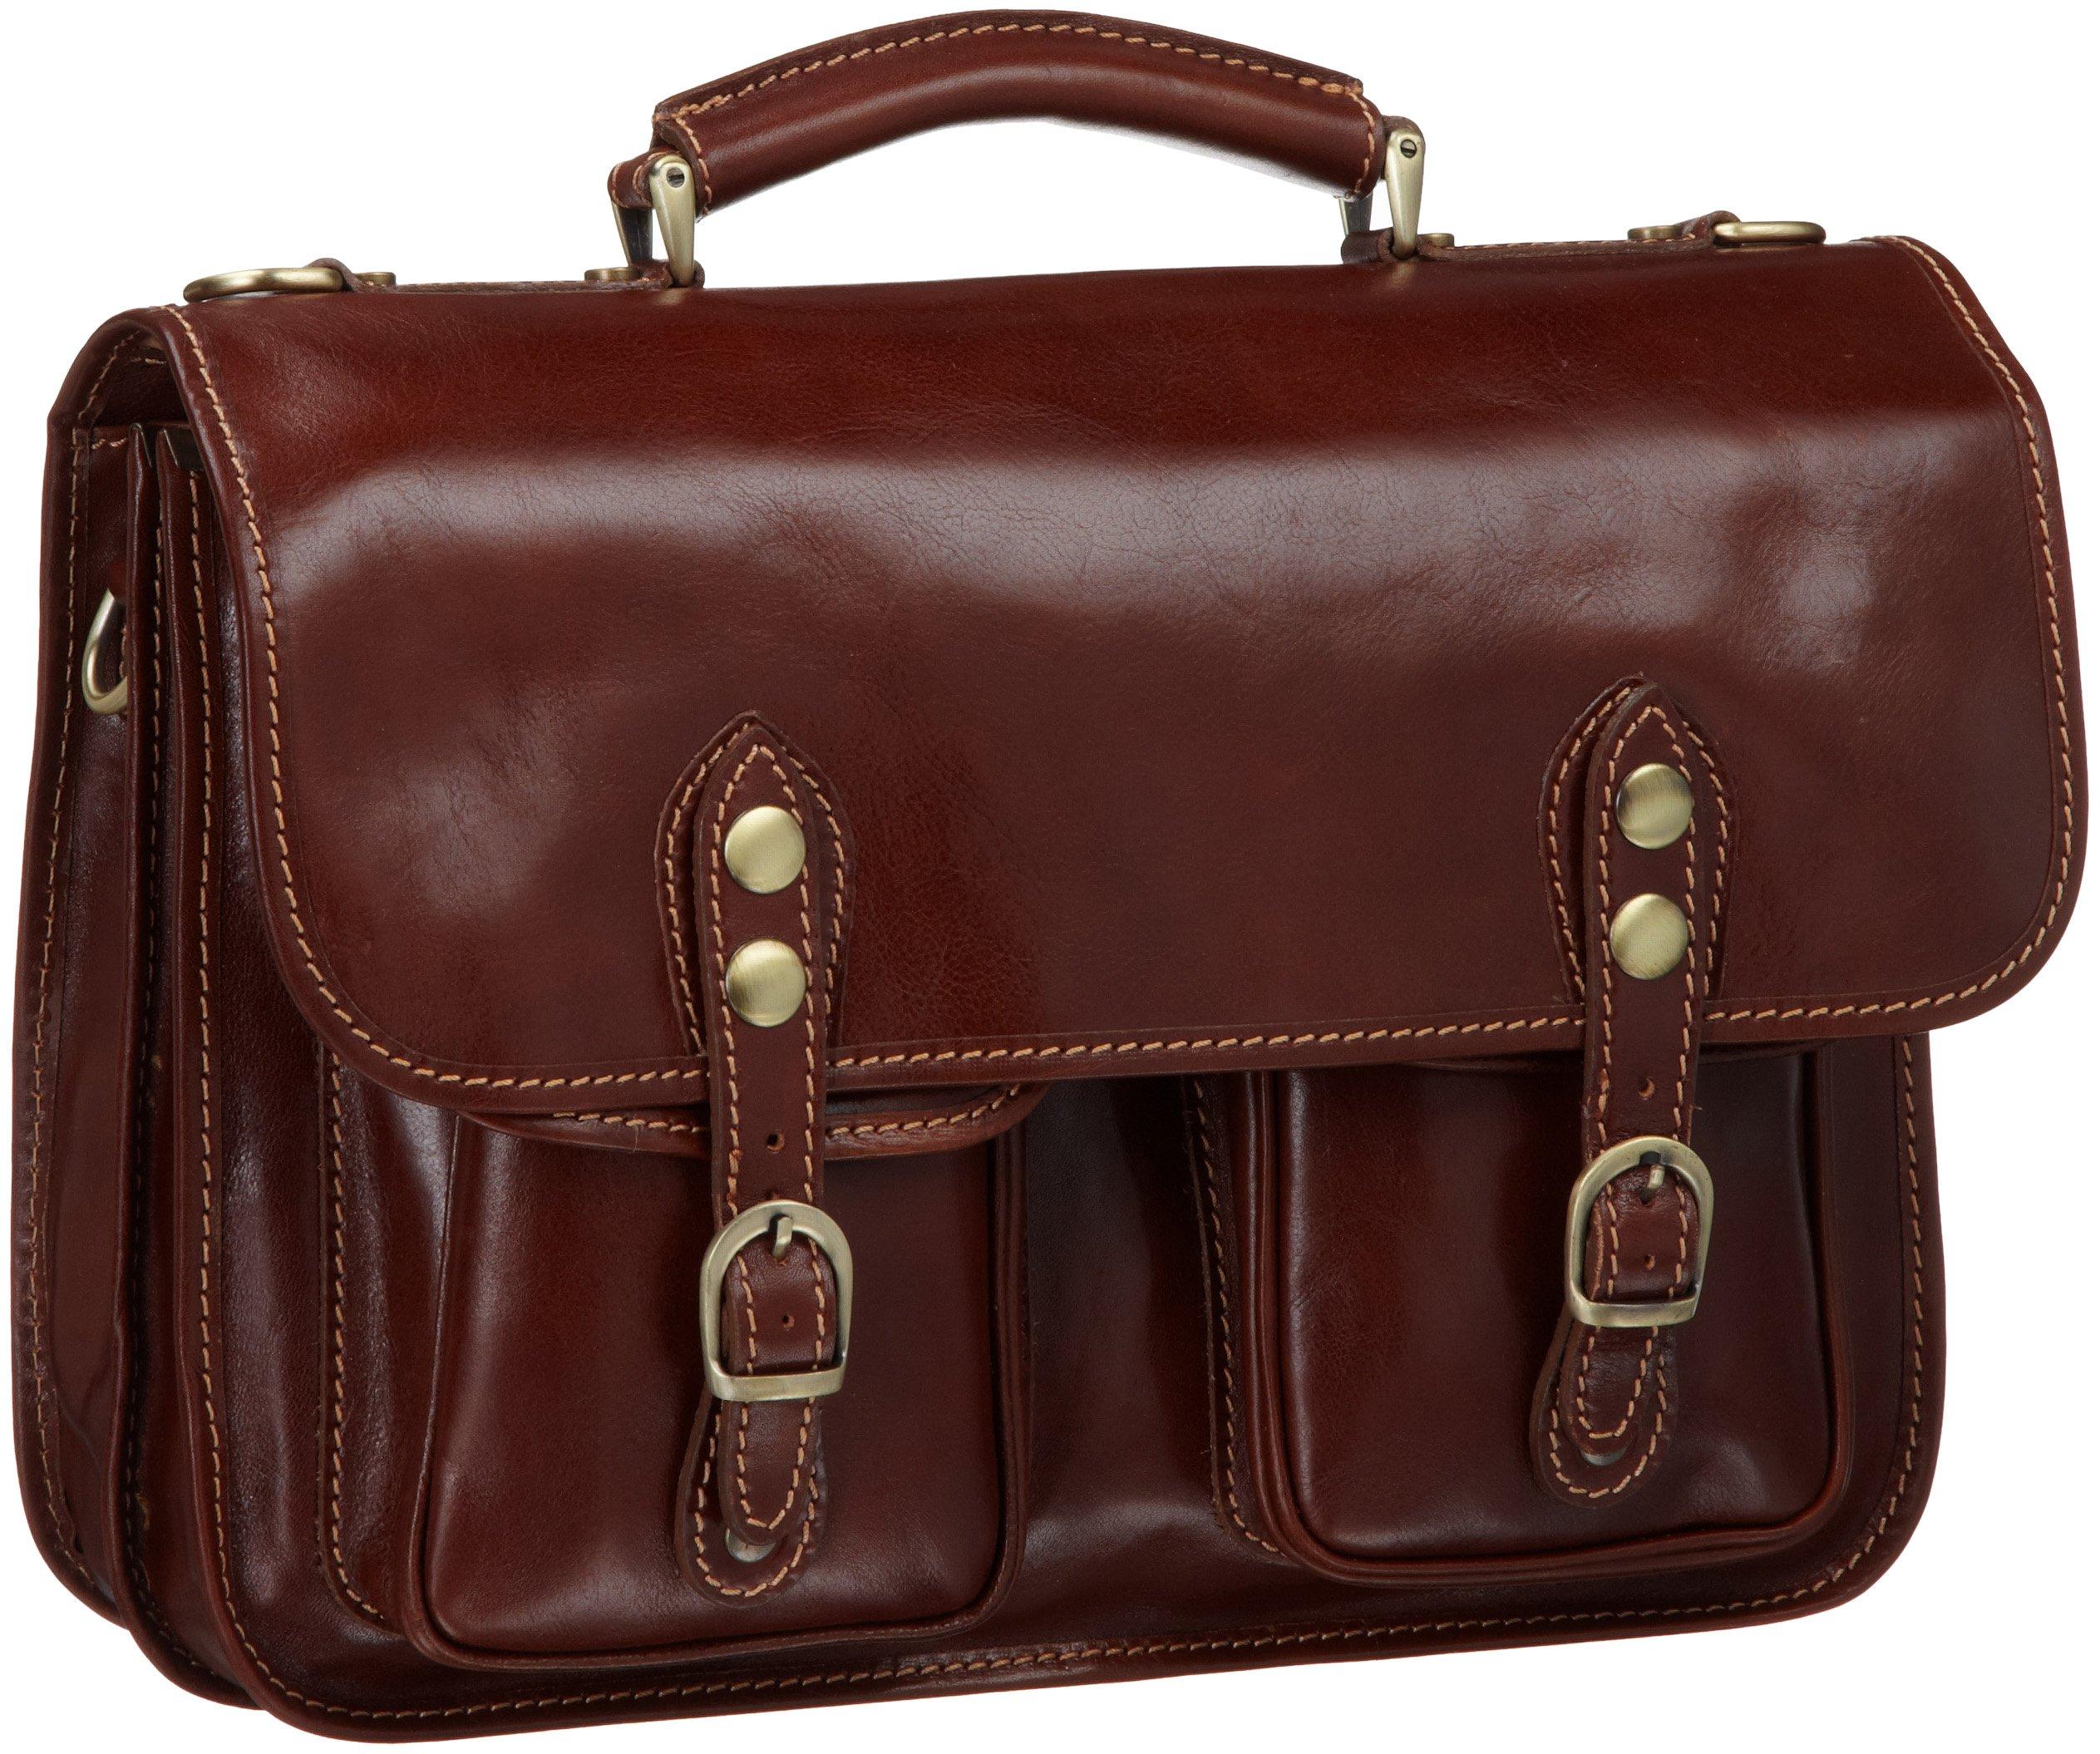 Floto Luggage Poste Messenger Bag, Brown, One Size